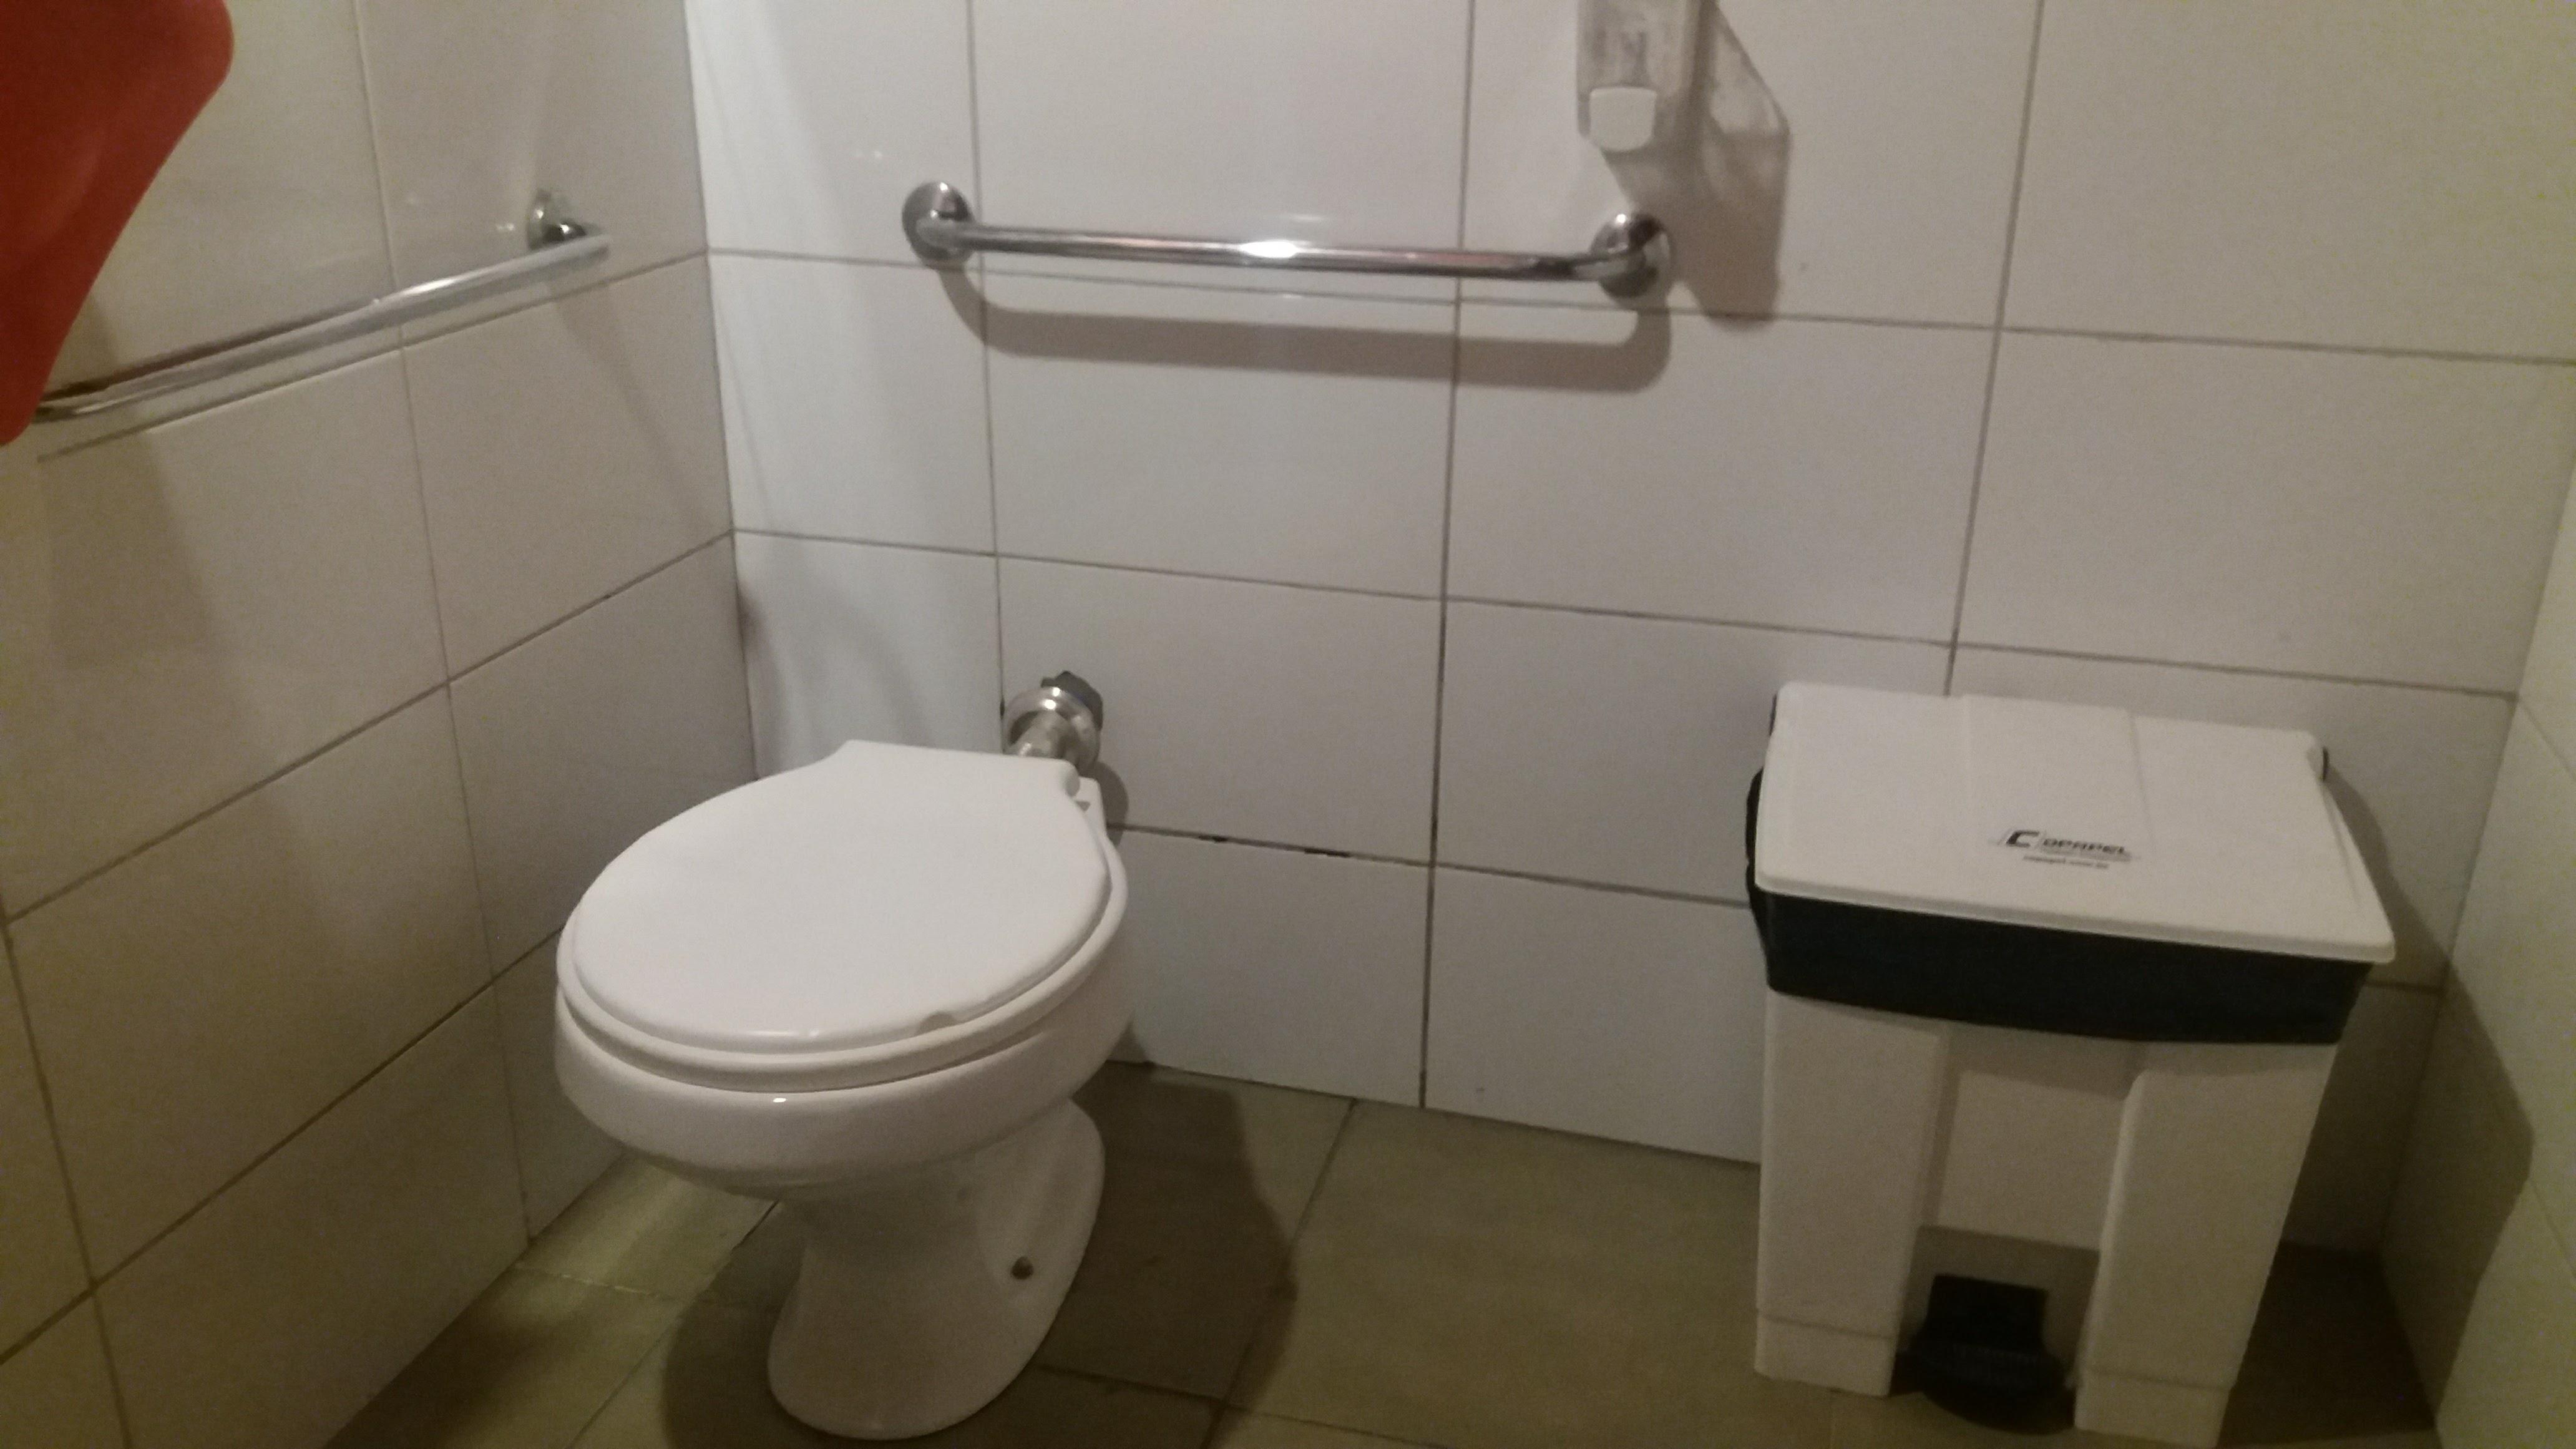 floripa-acessível-banheiro-chopp-do-gus